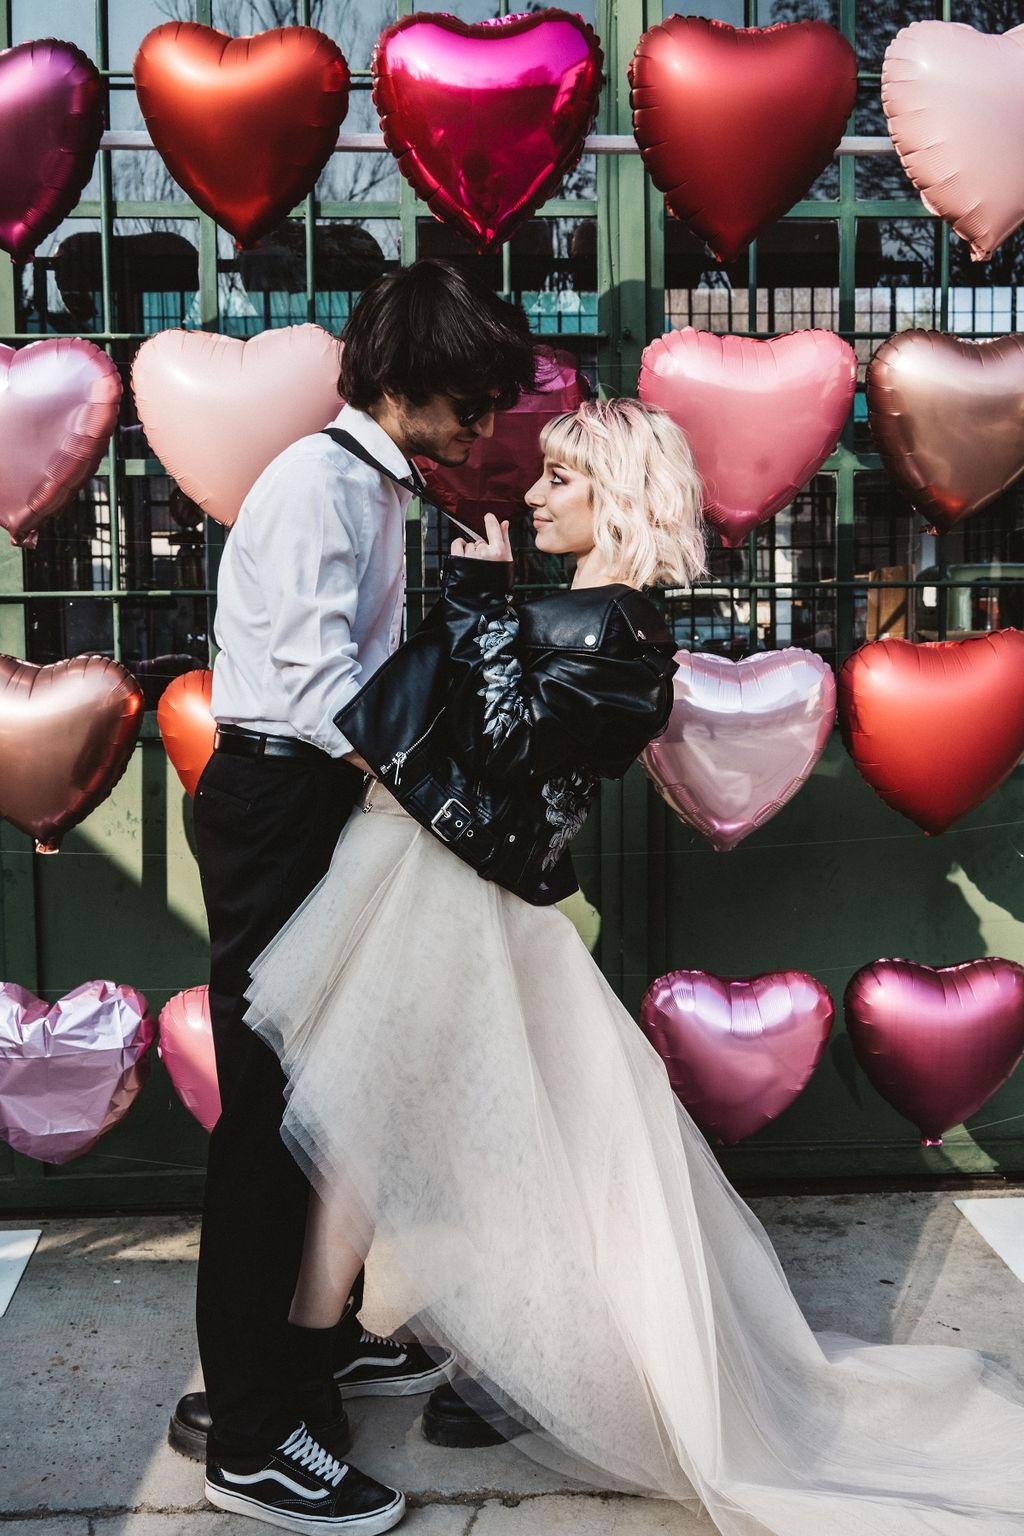 modern industrial wedding - alternative wedding - unconventional wedding - edgy wedding - funky wedding backdrop - heart shaped wedding balloons - alternative wedding balloons